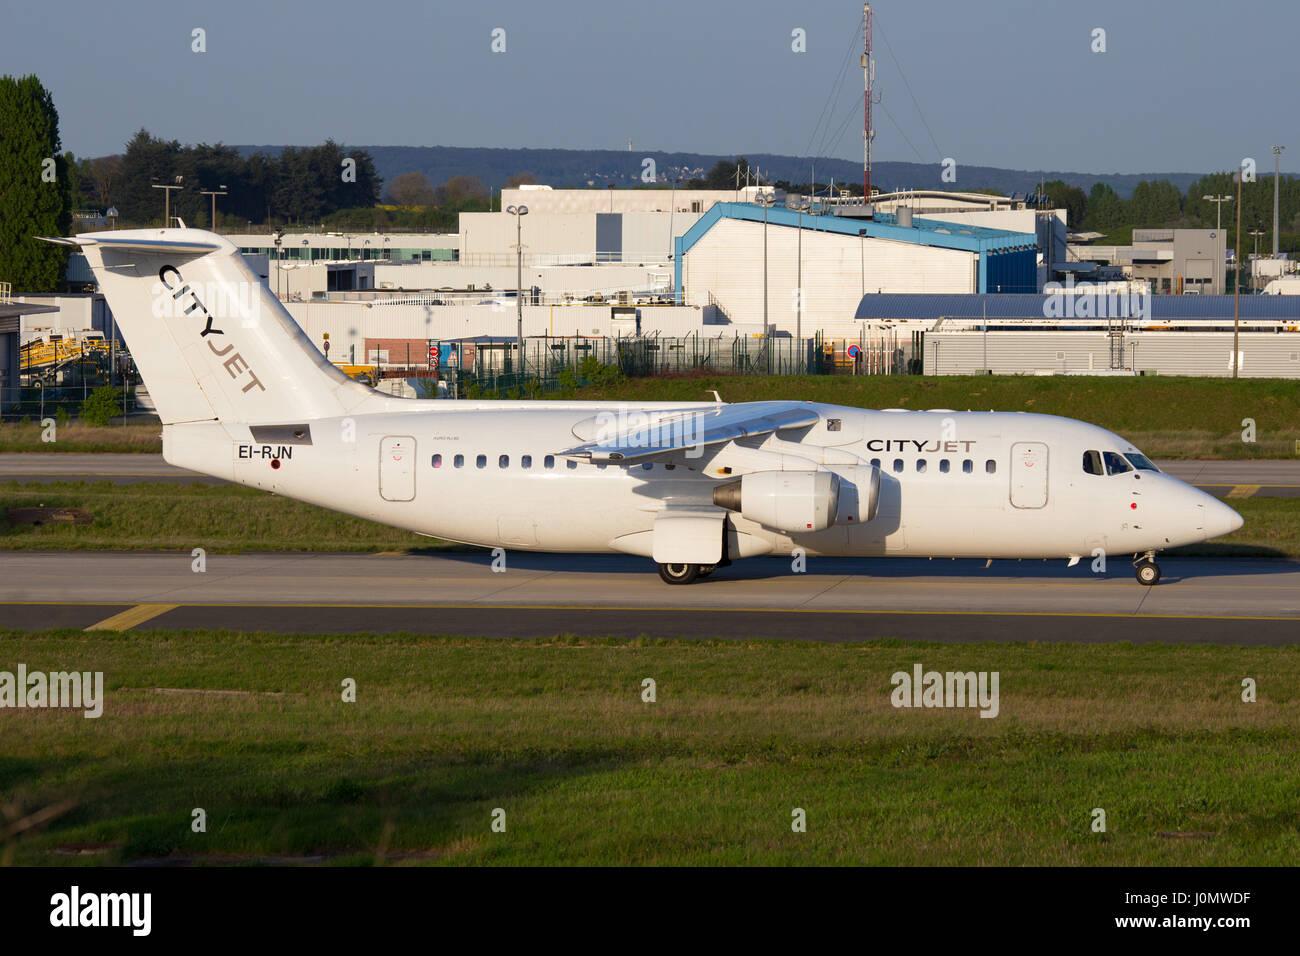 City jet Avro RJ85 Aircraft Image - Stock Image